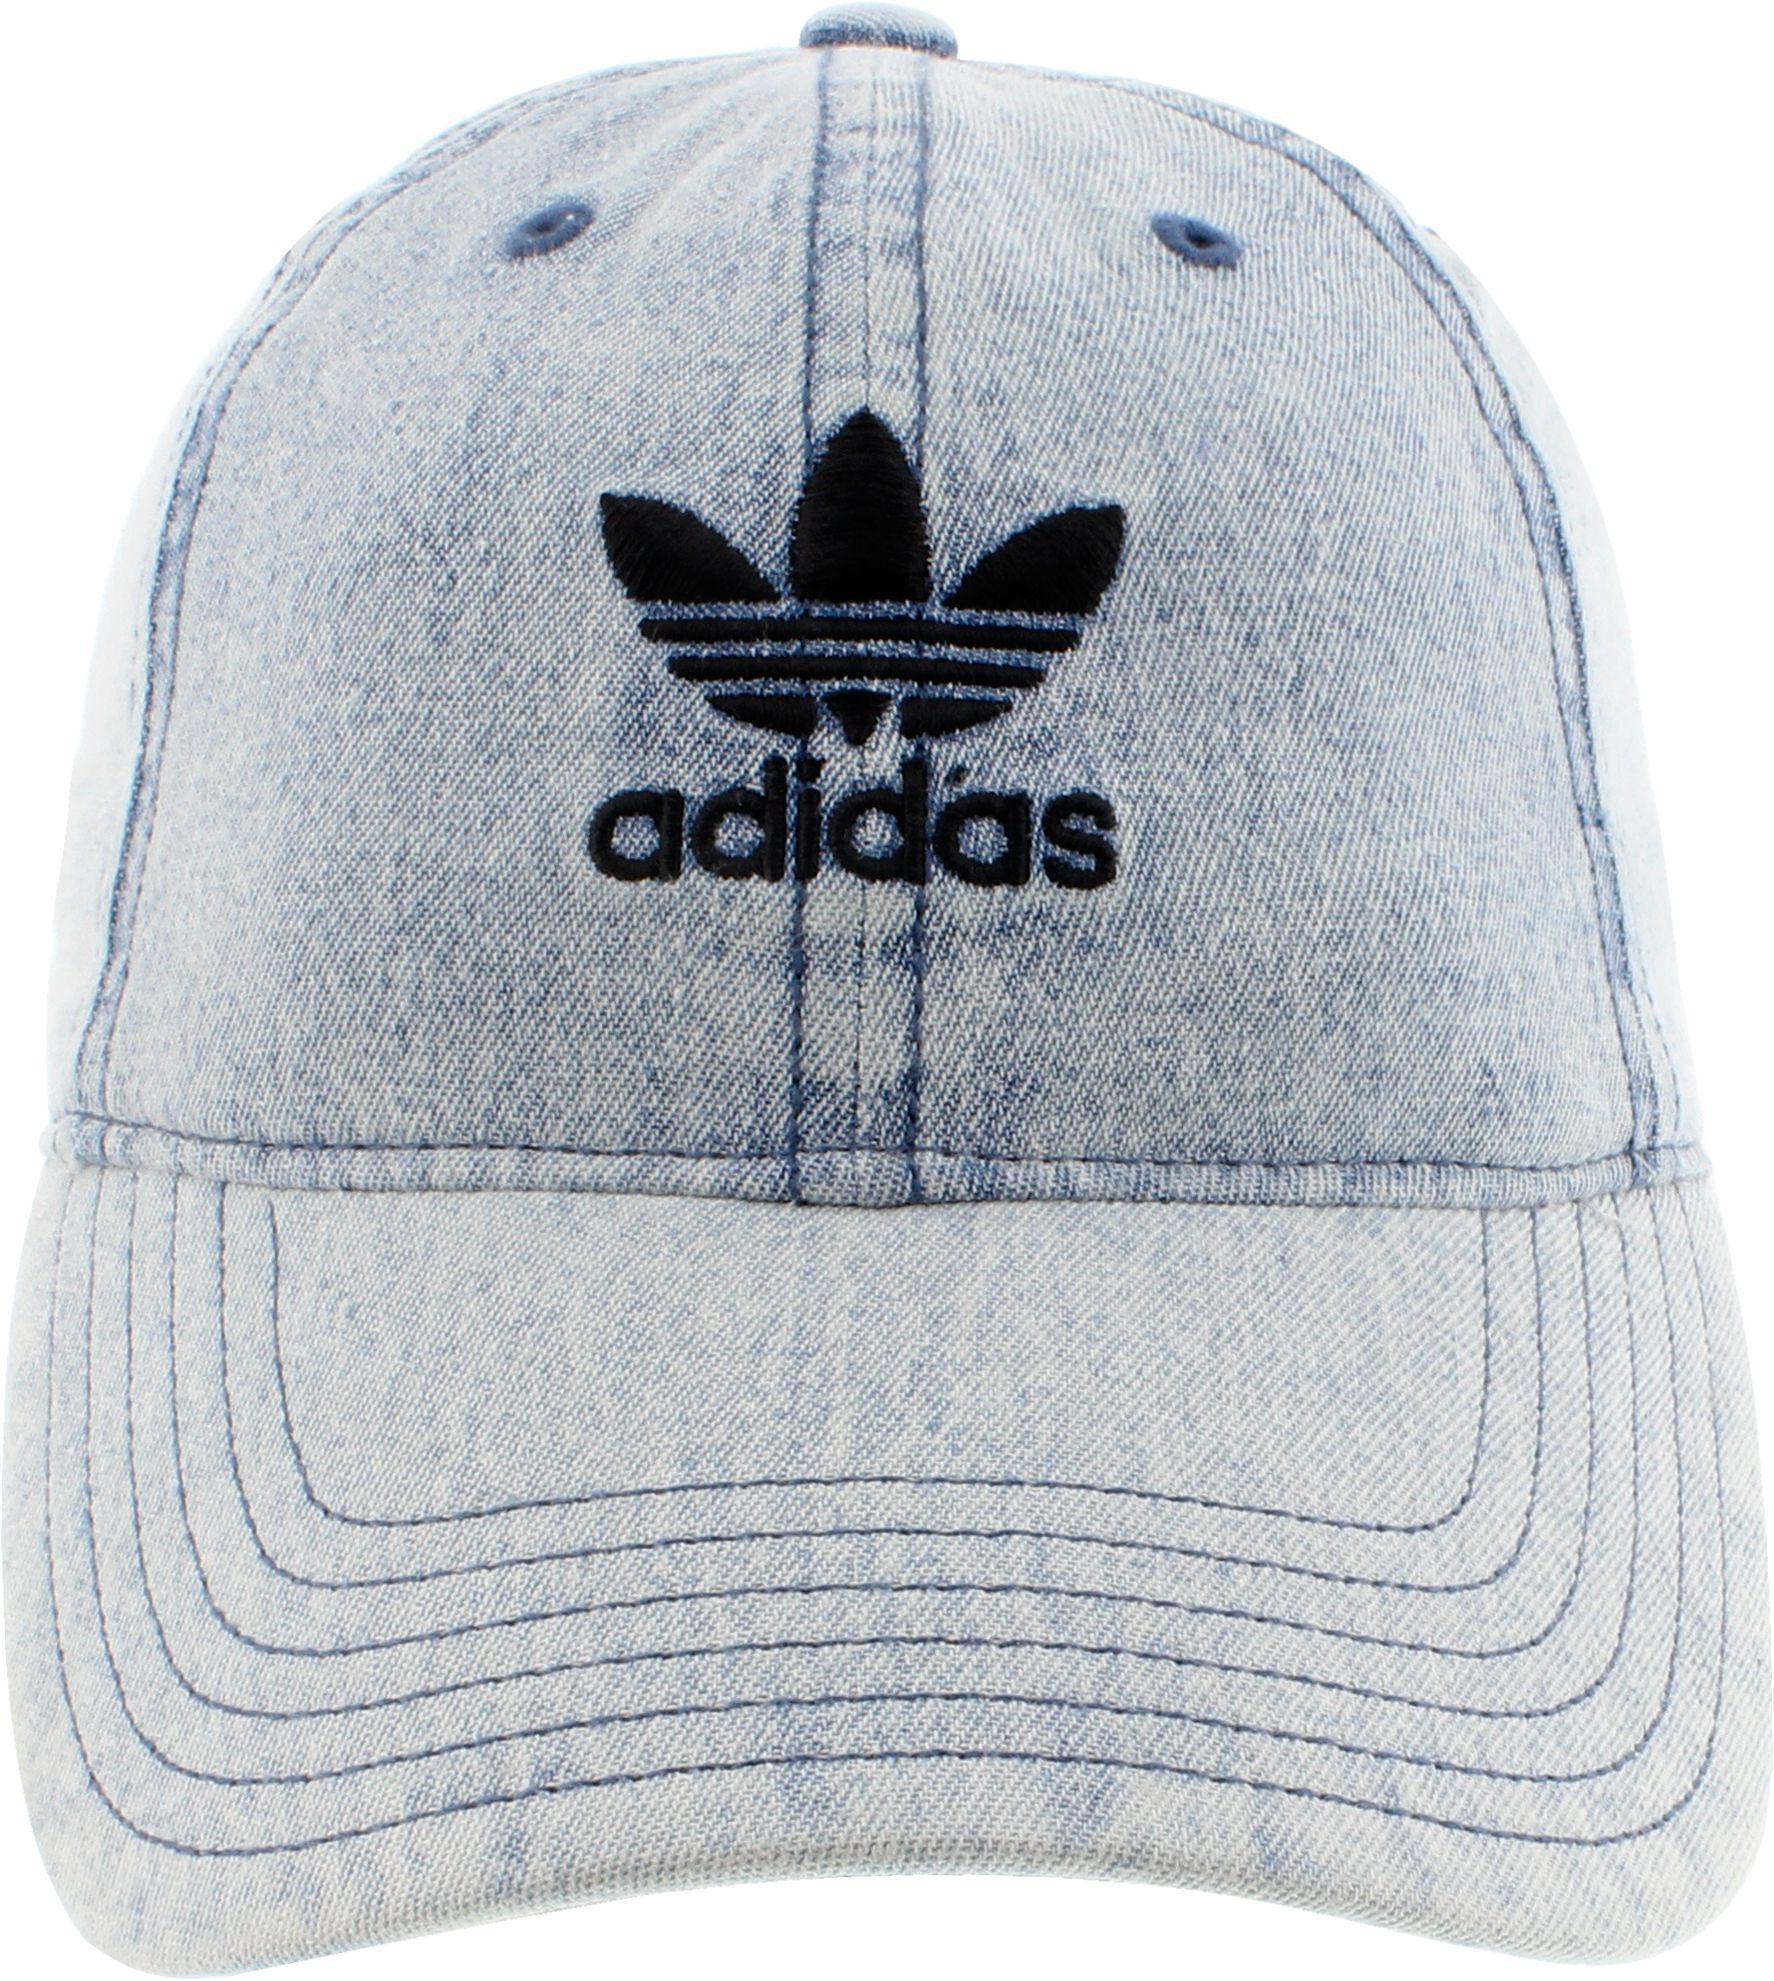 5e26bd1b74b Adidas - Blue Originals Relaxed Denim Cap - Lyst. View fullscreen